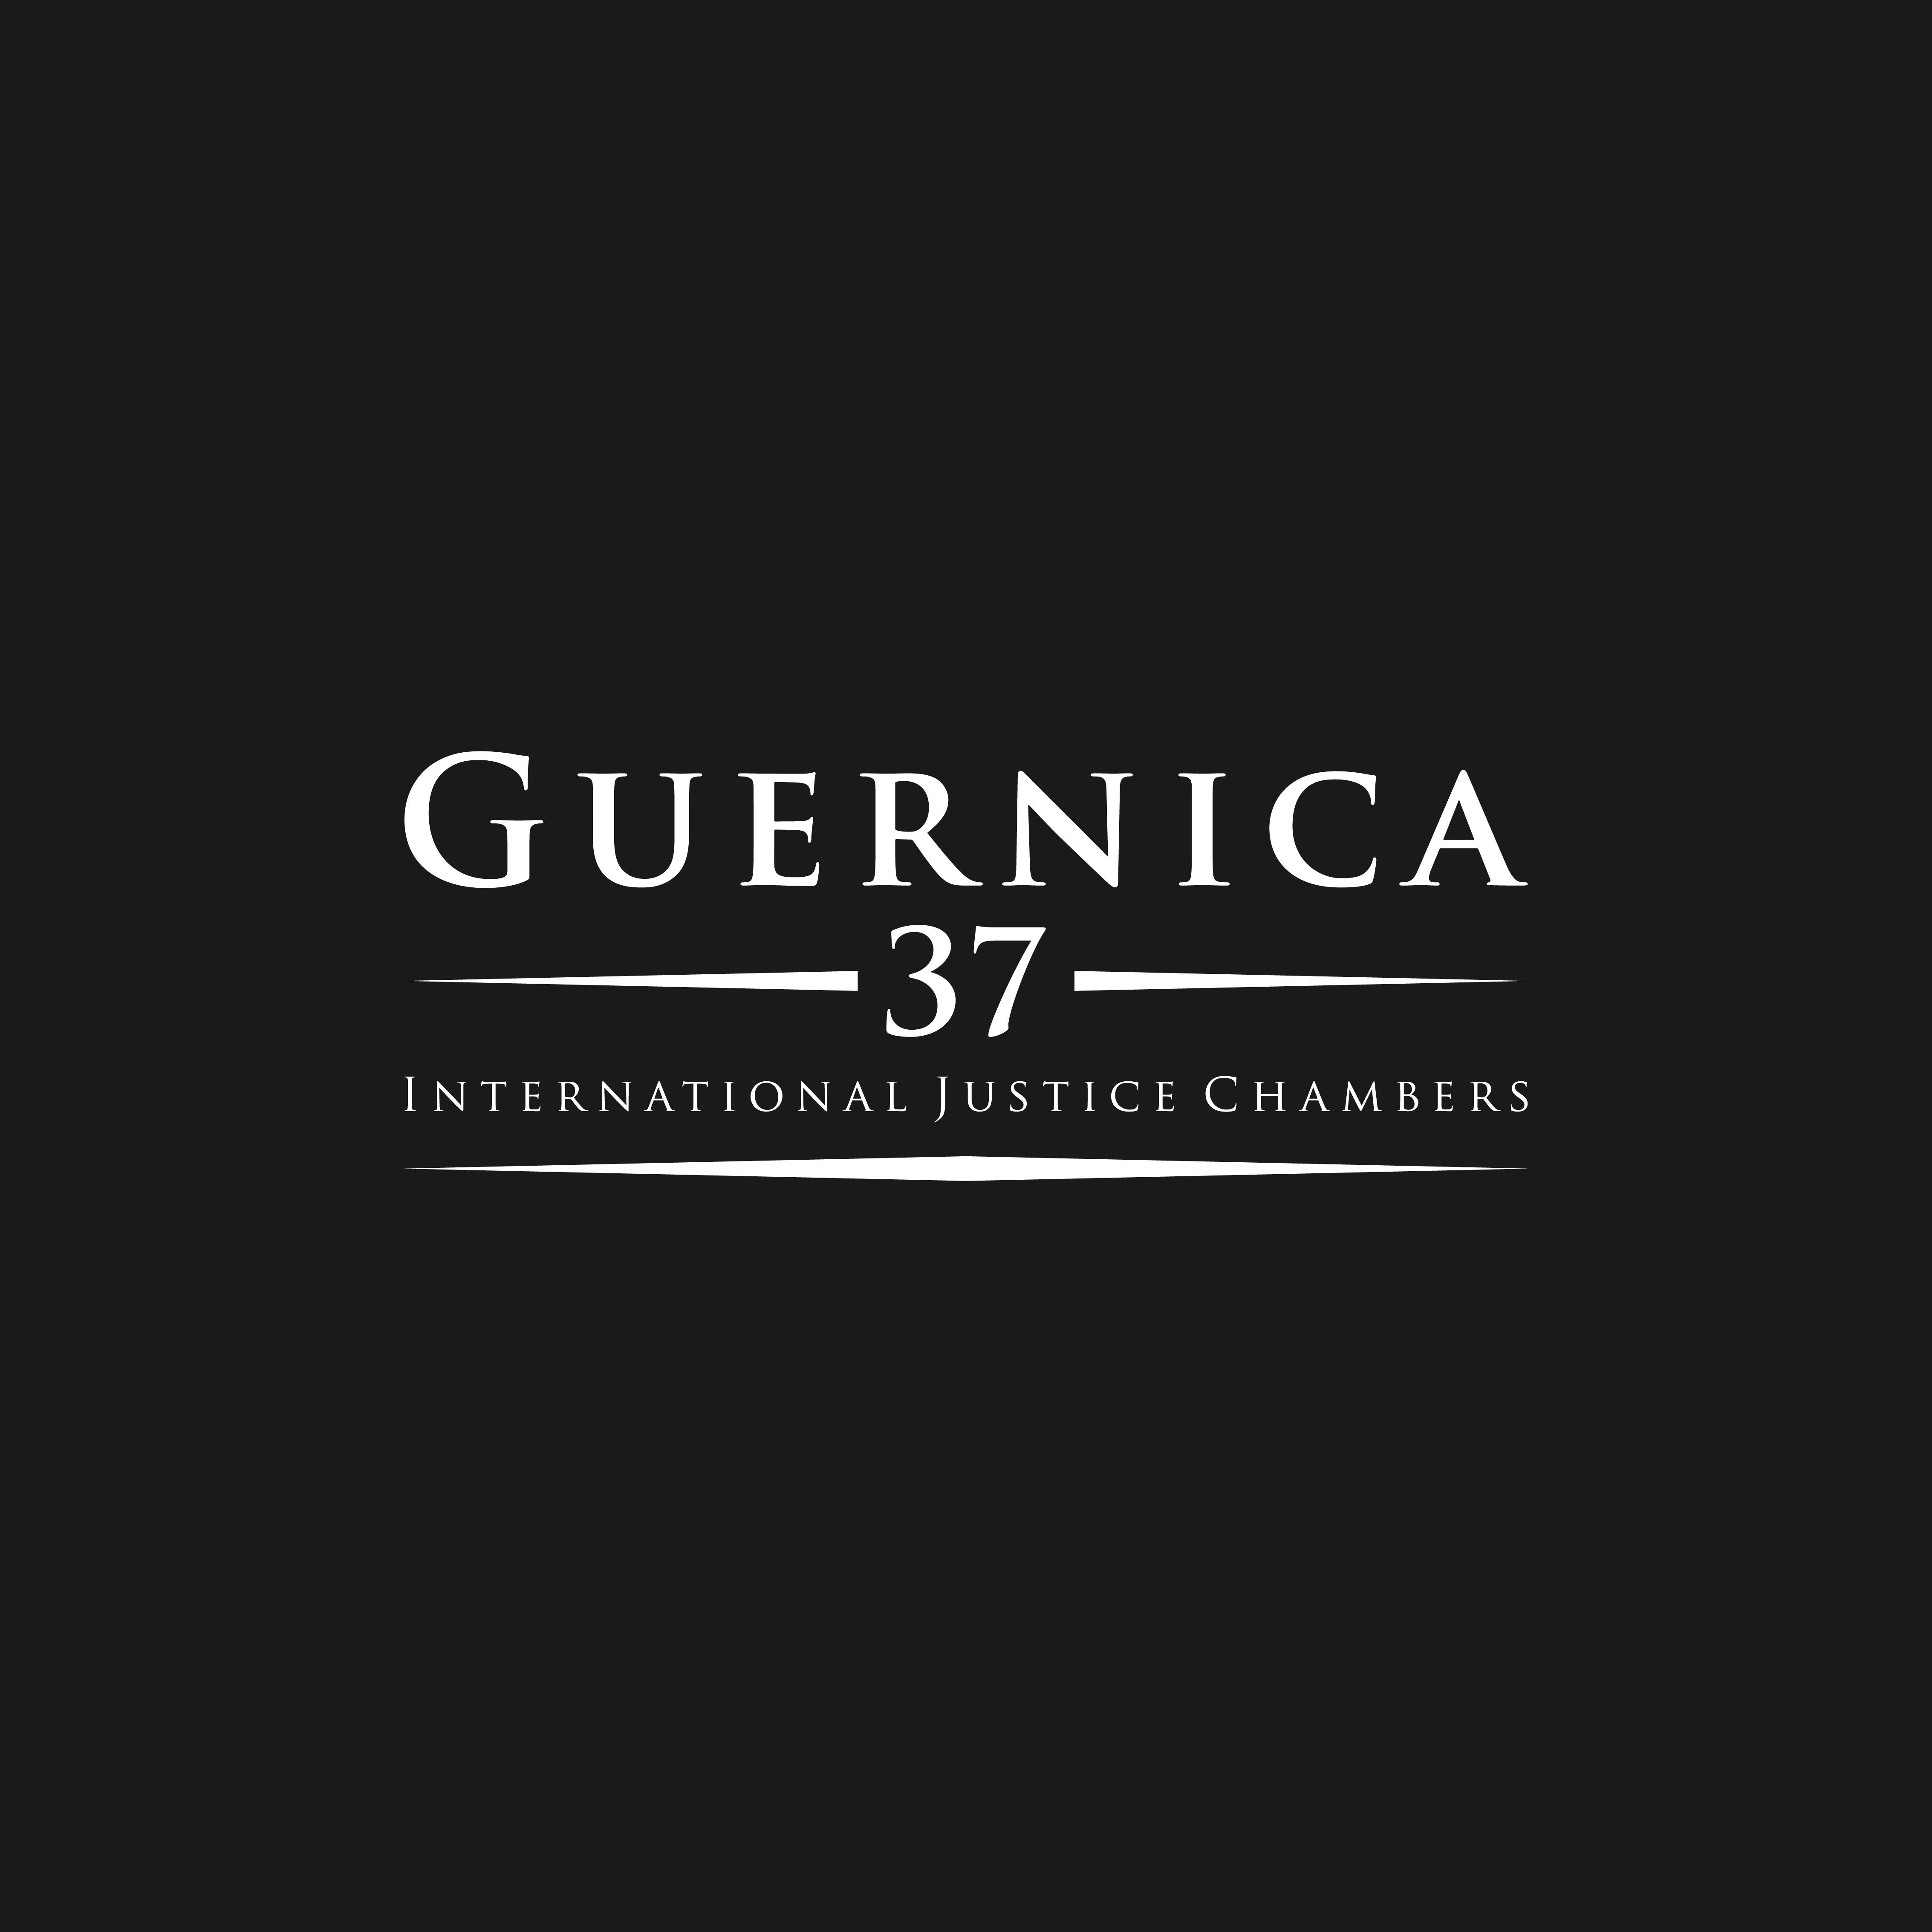 Guernica 37 (2)